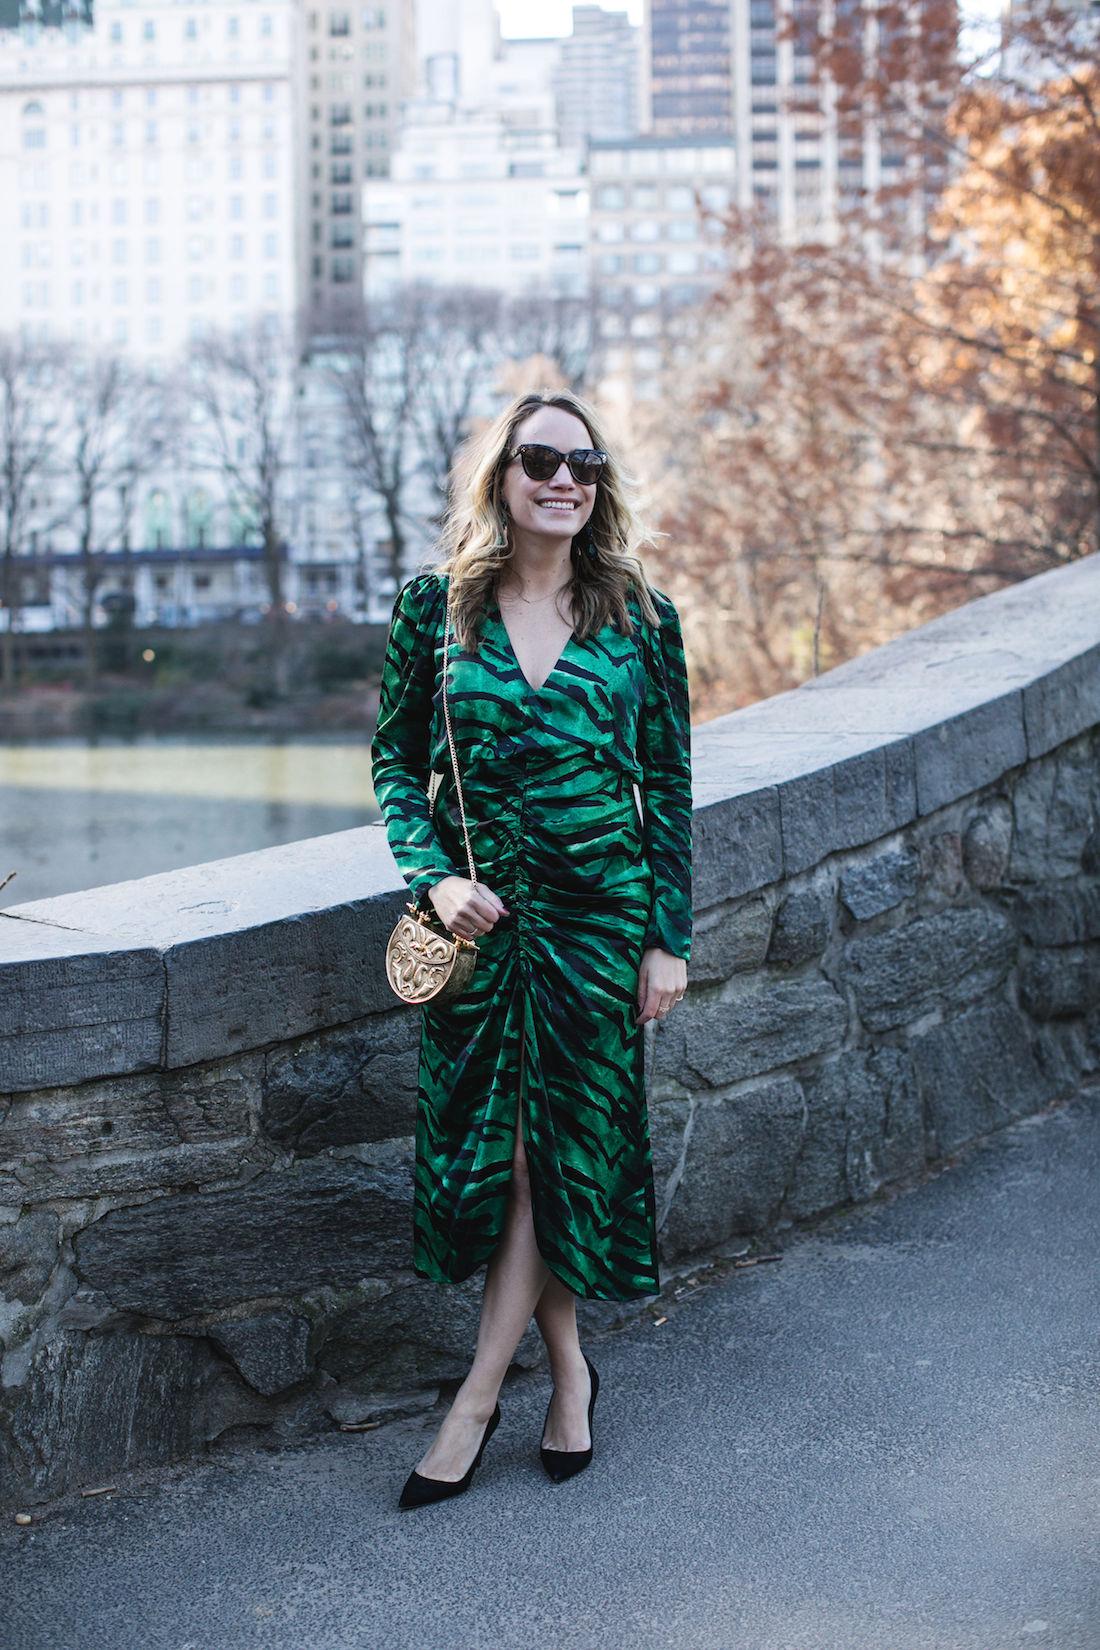 Outfit Details: Topshop Dress // Manolo Blahnik Pumps // Okhtein Bag // Kendra Scott Earrings